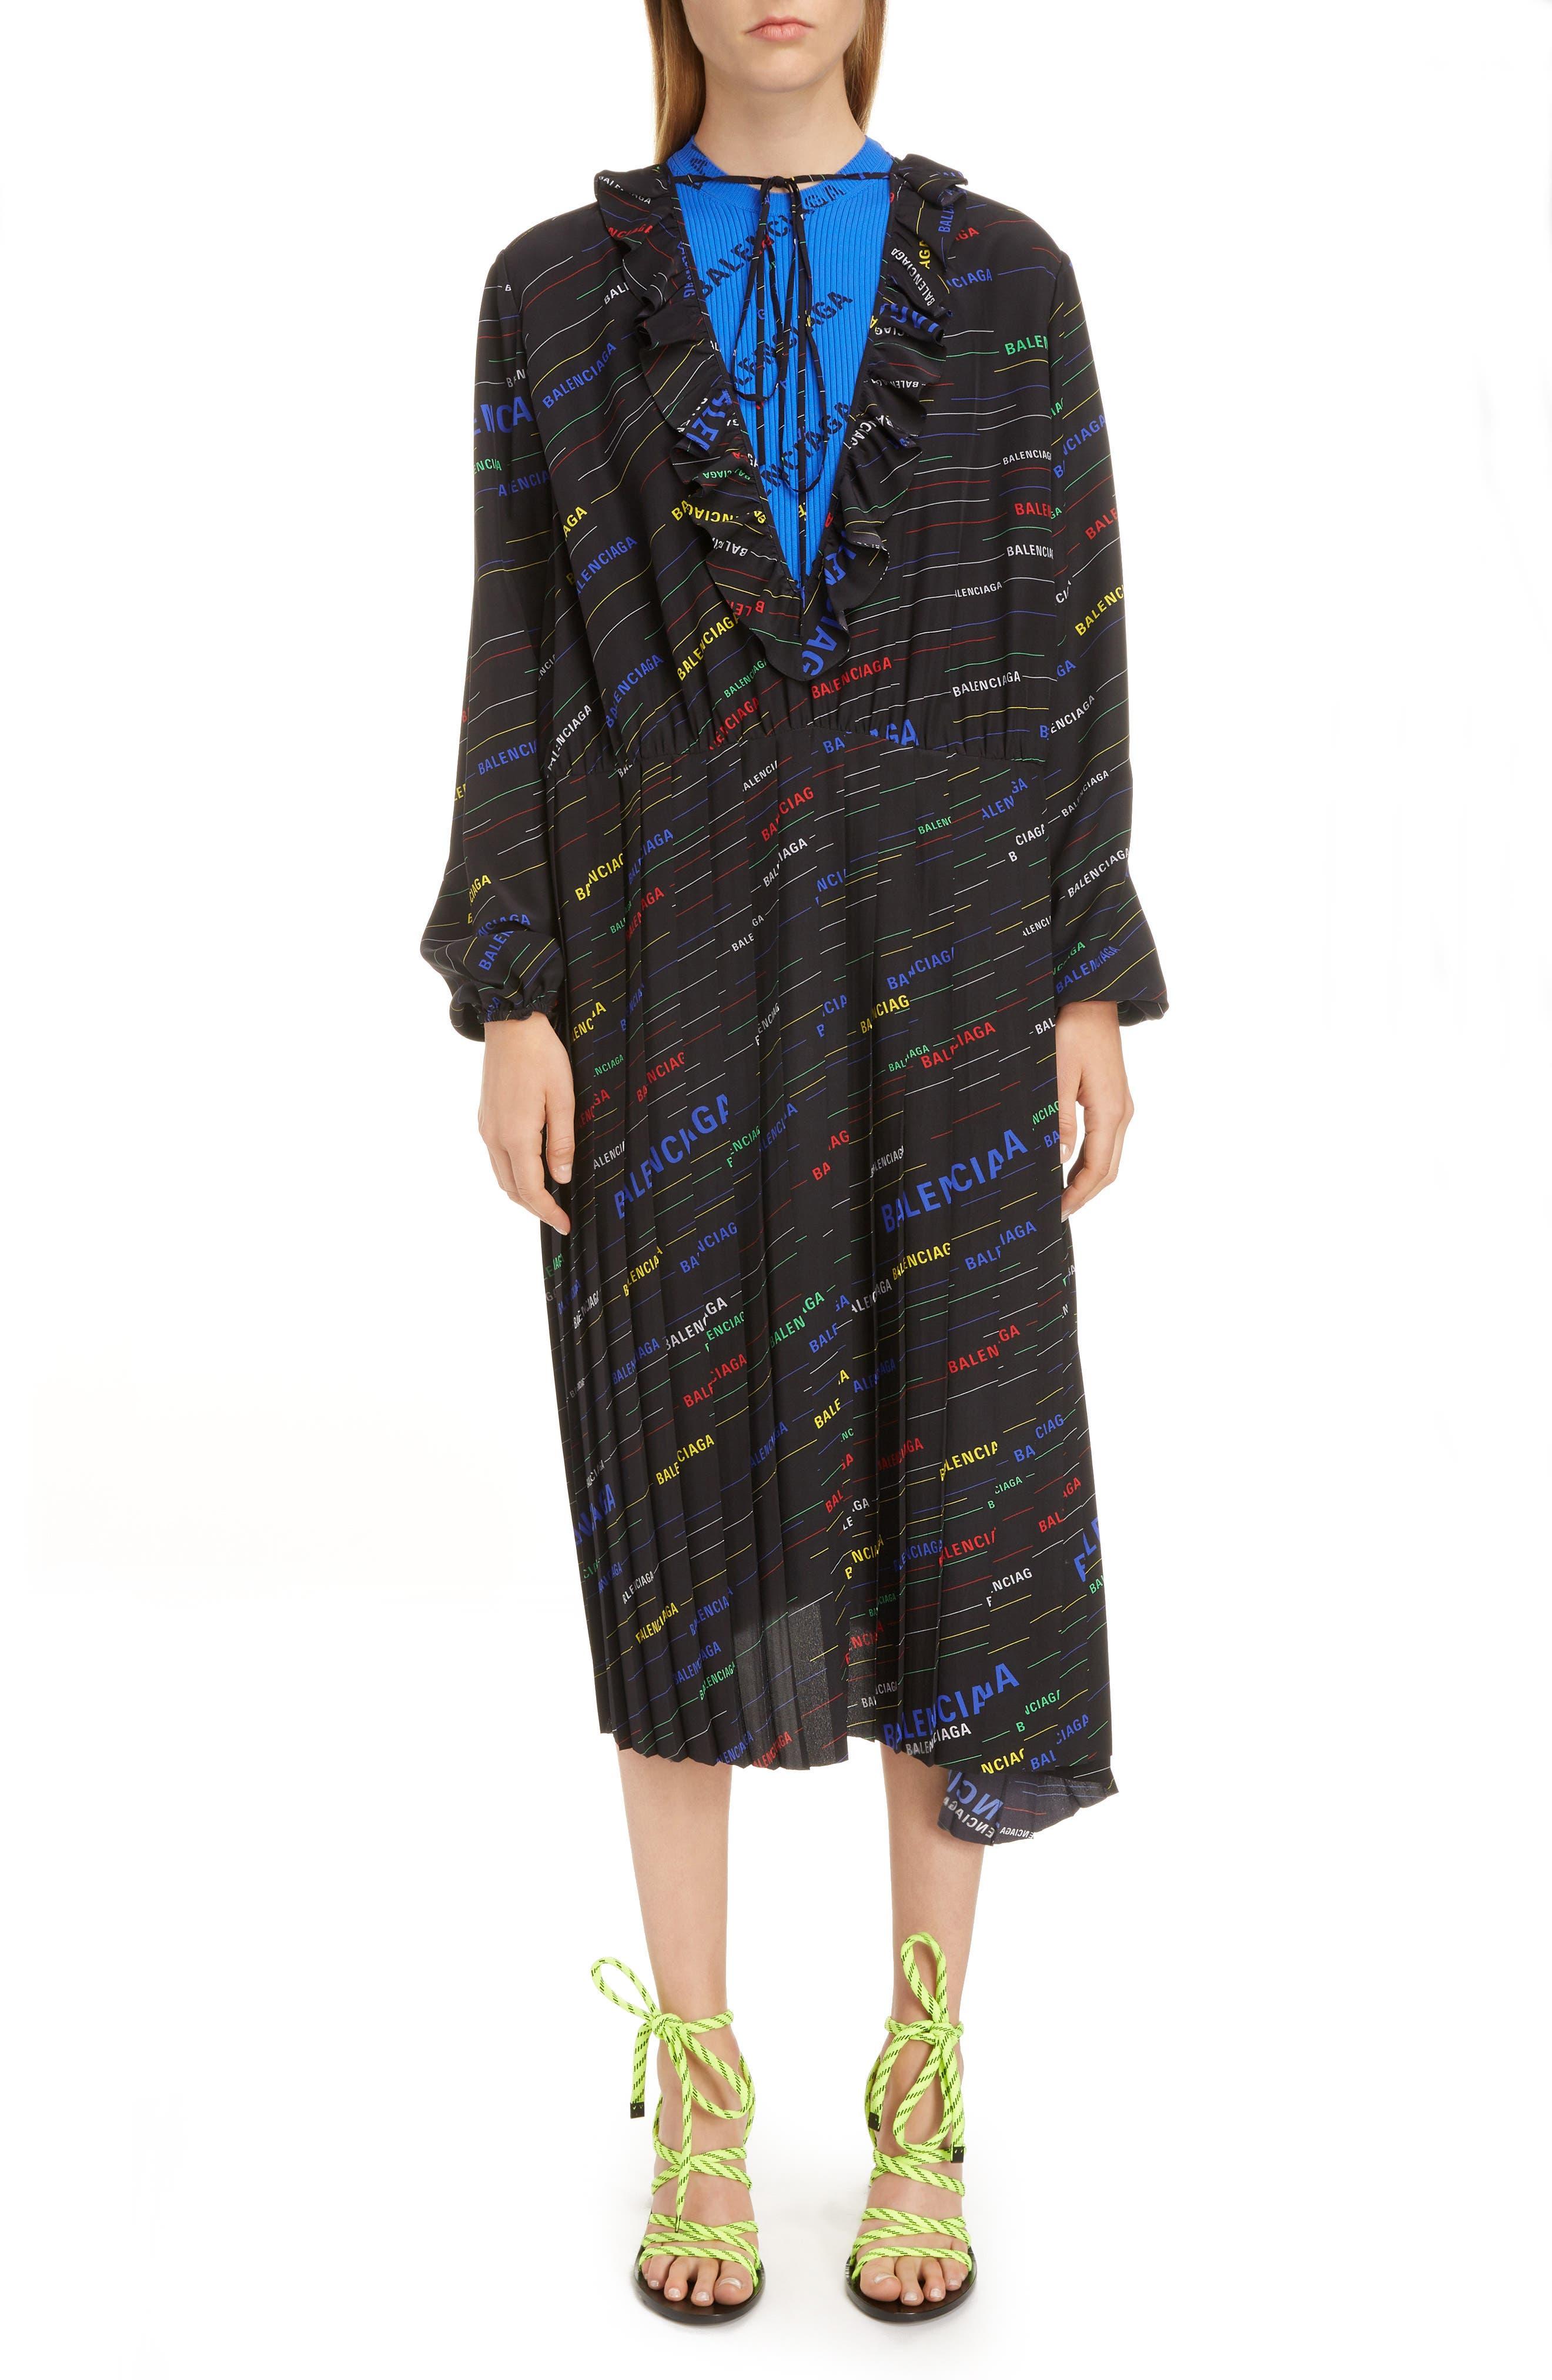 Balenciaga Stripe Logo Print Ruffle Dress, US / 40 FR - Black